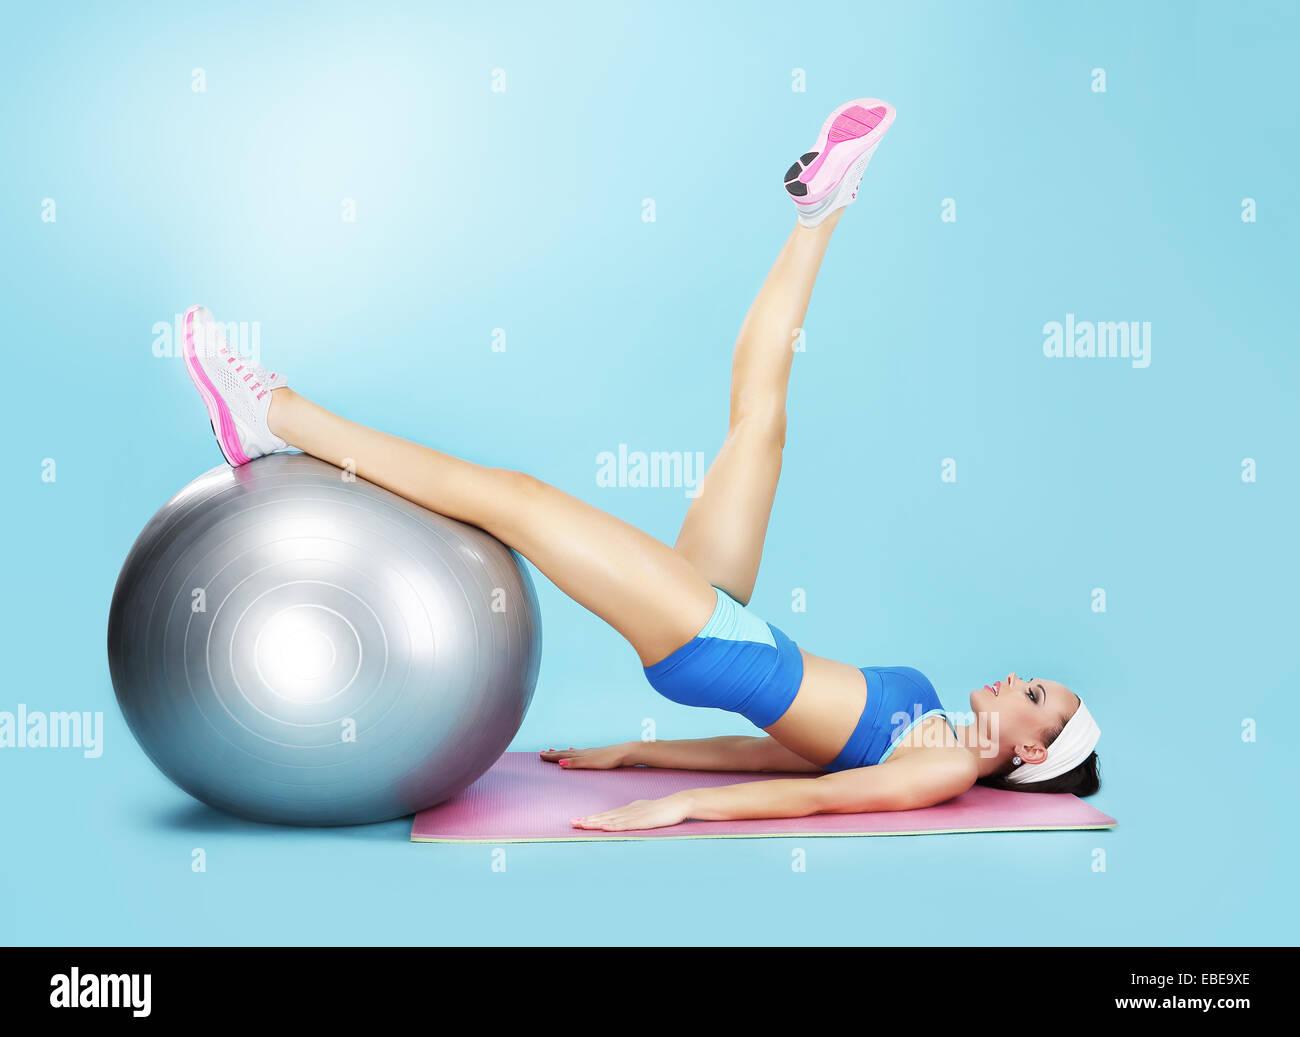 Aerobics. Sportlerin im Sportverein mit Fitness-Ball Stockbild